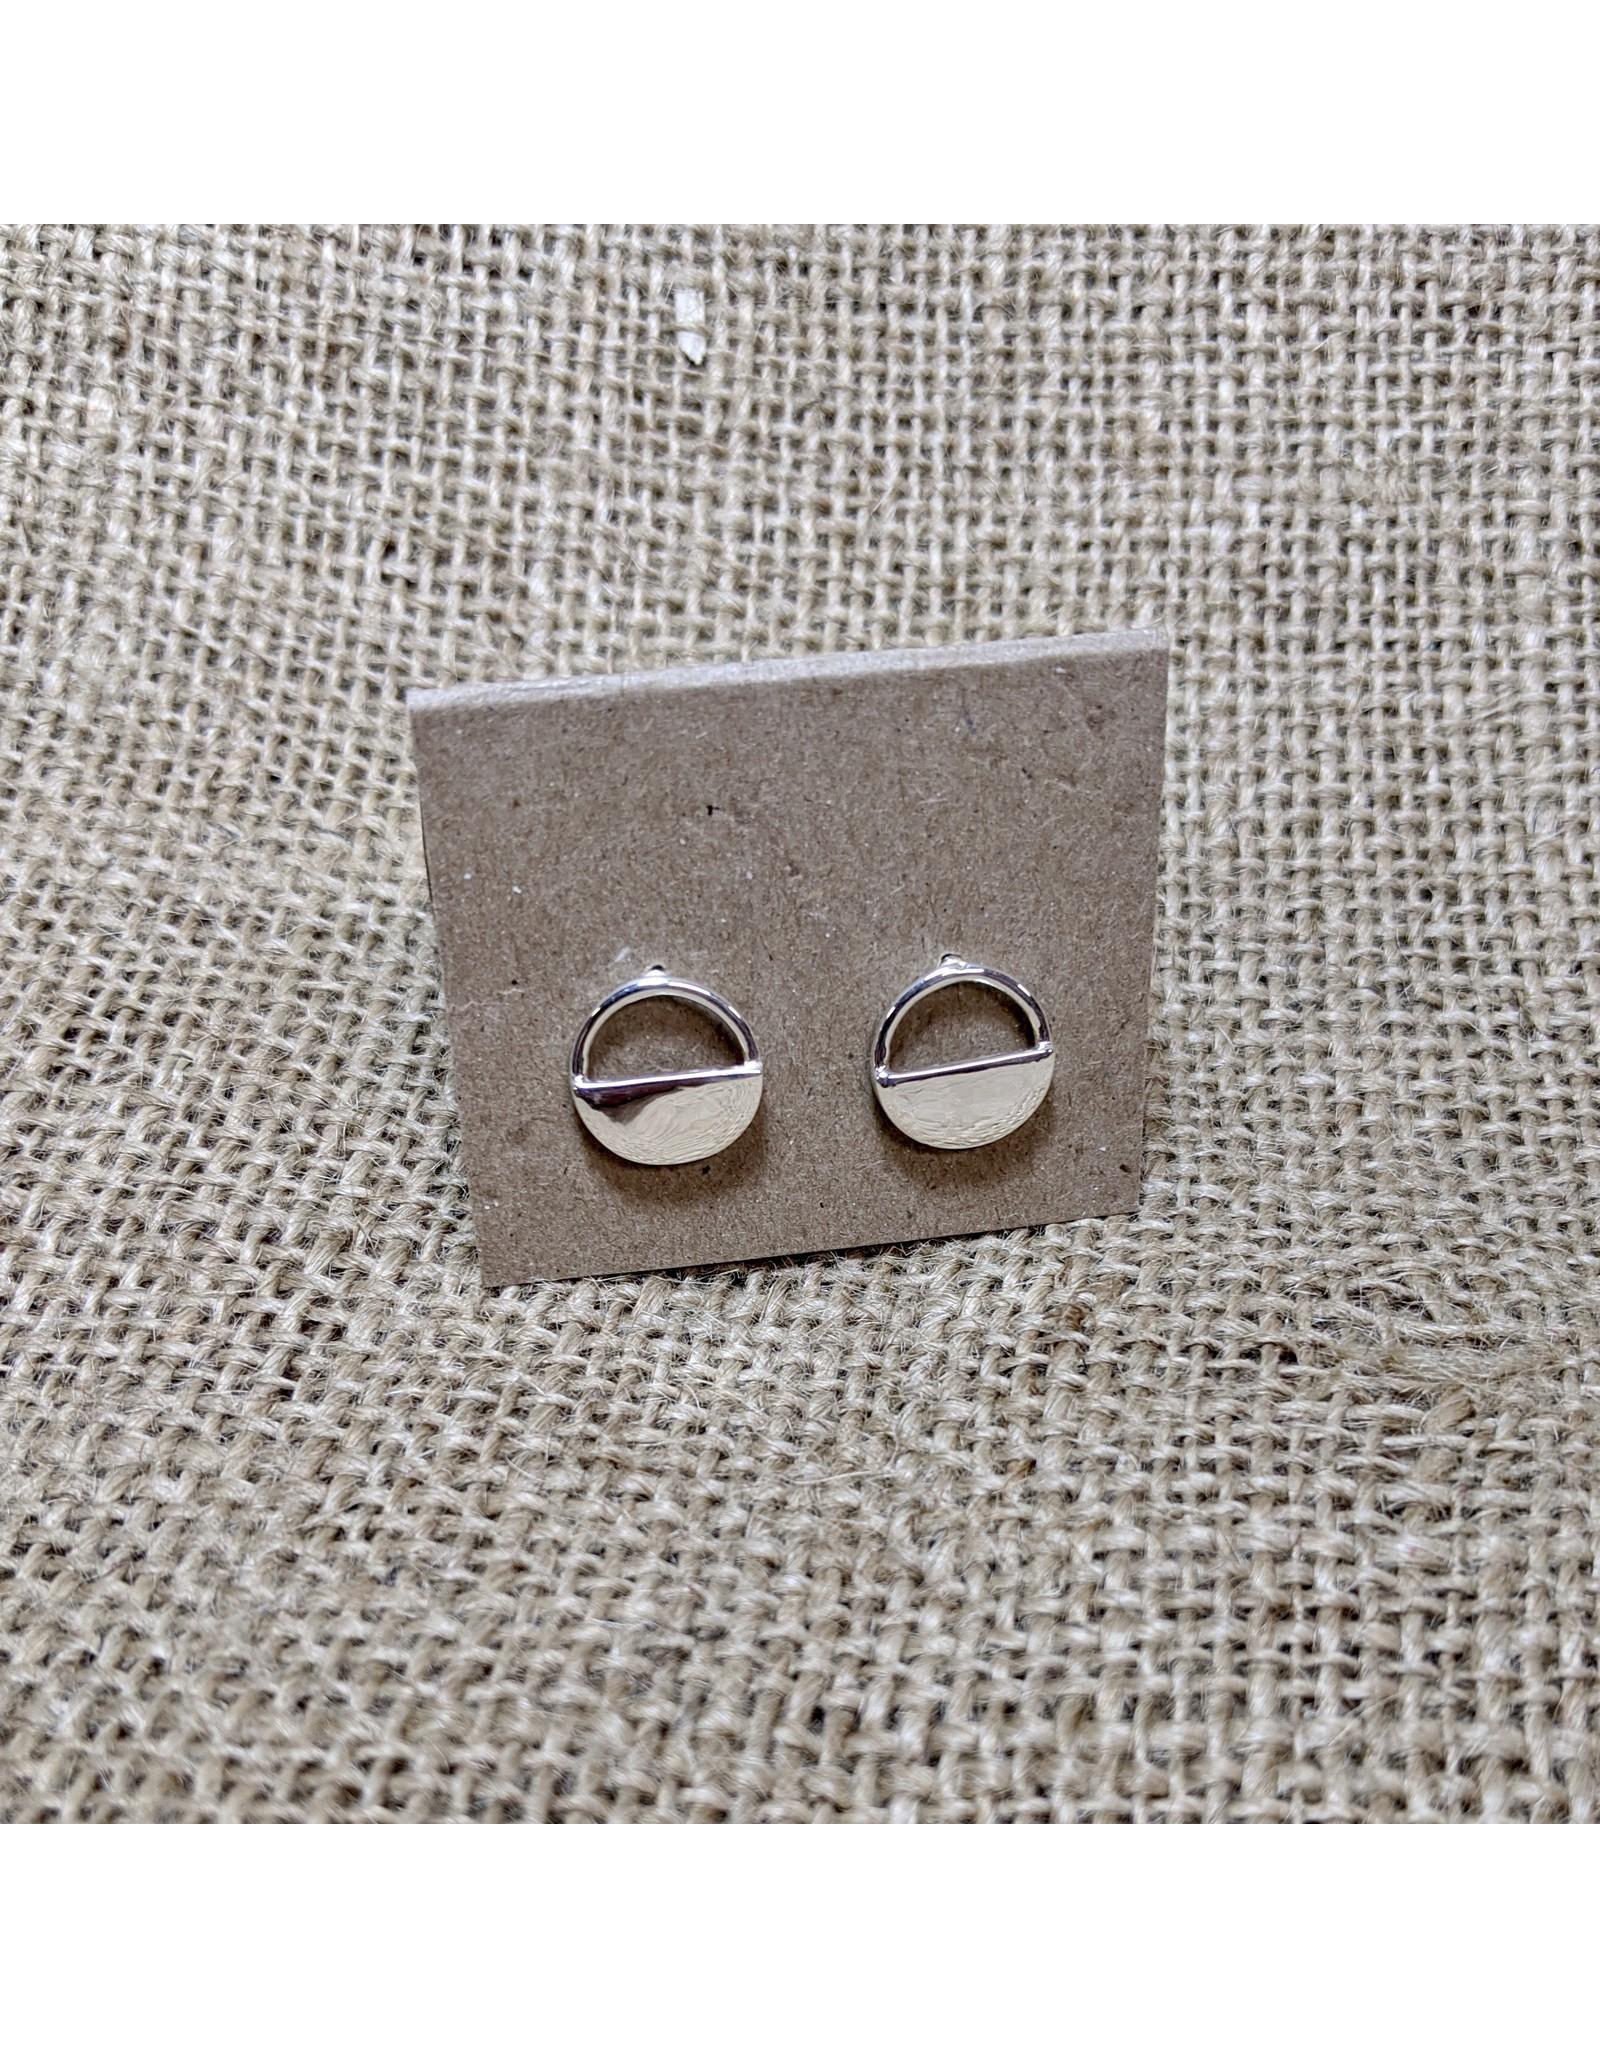 Ten Thousand Villages Half-moon Stud Earrings, India